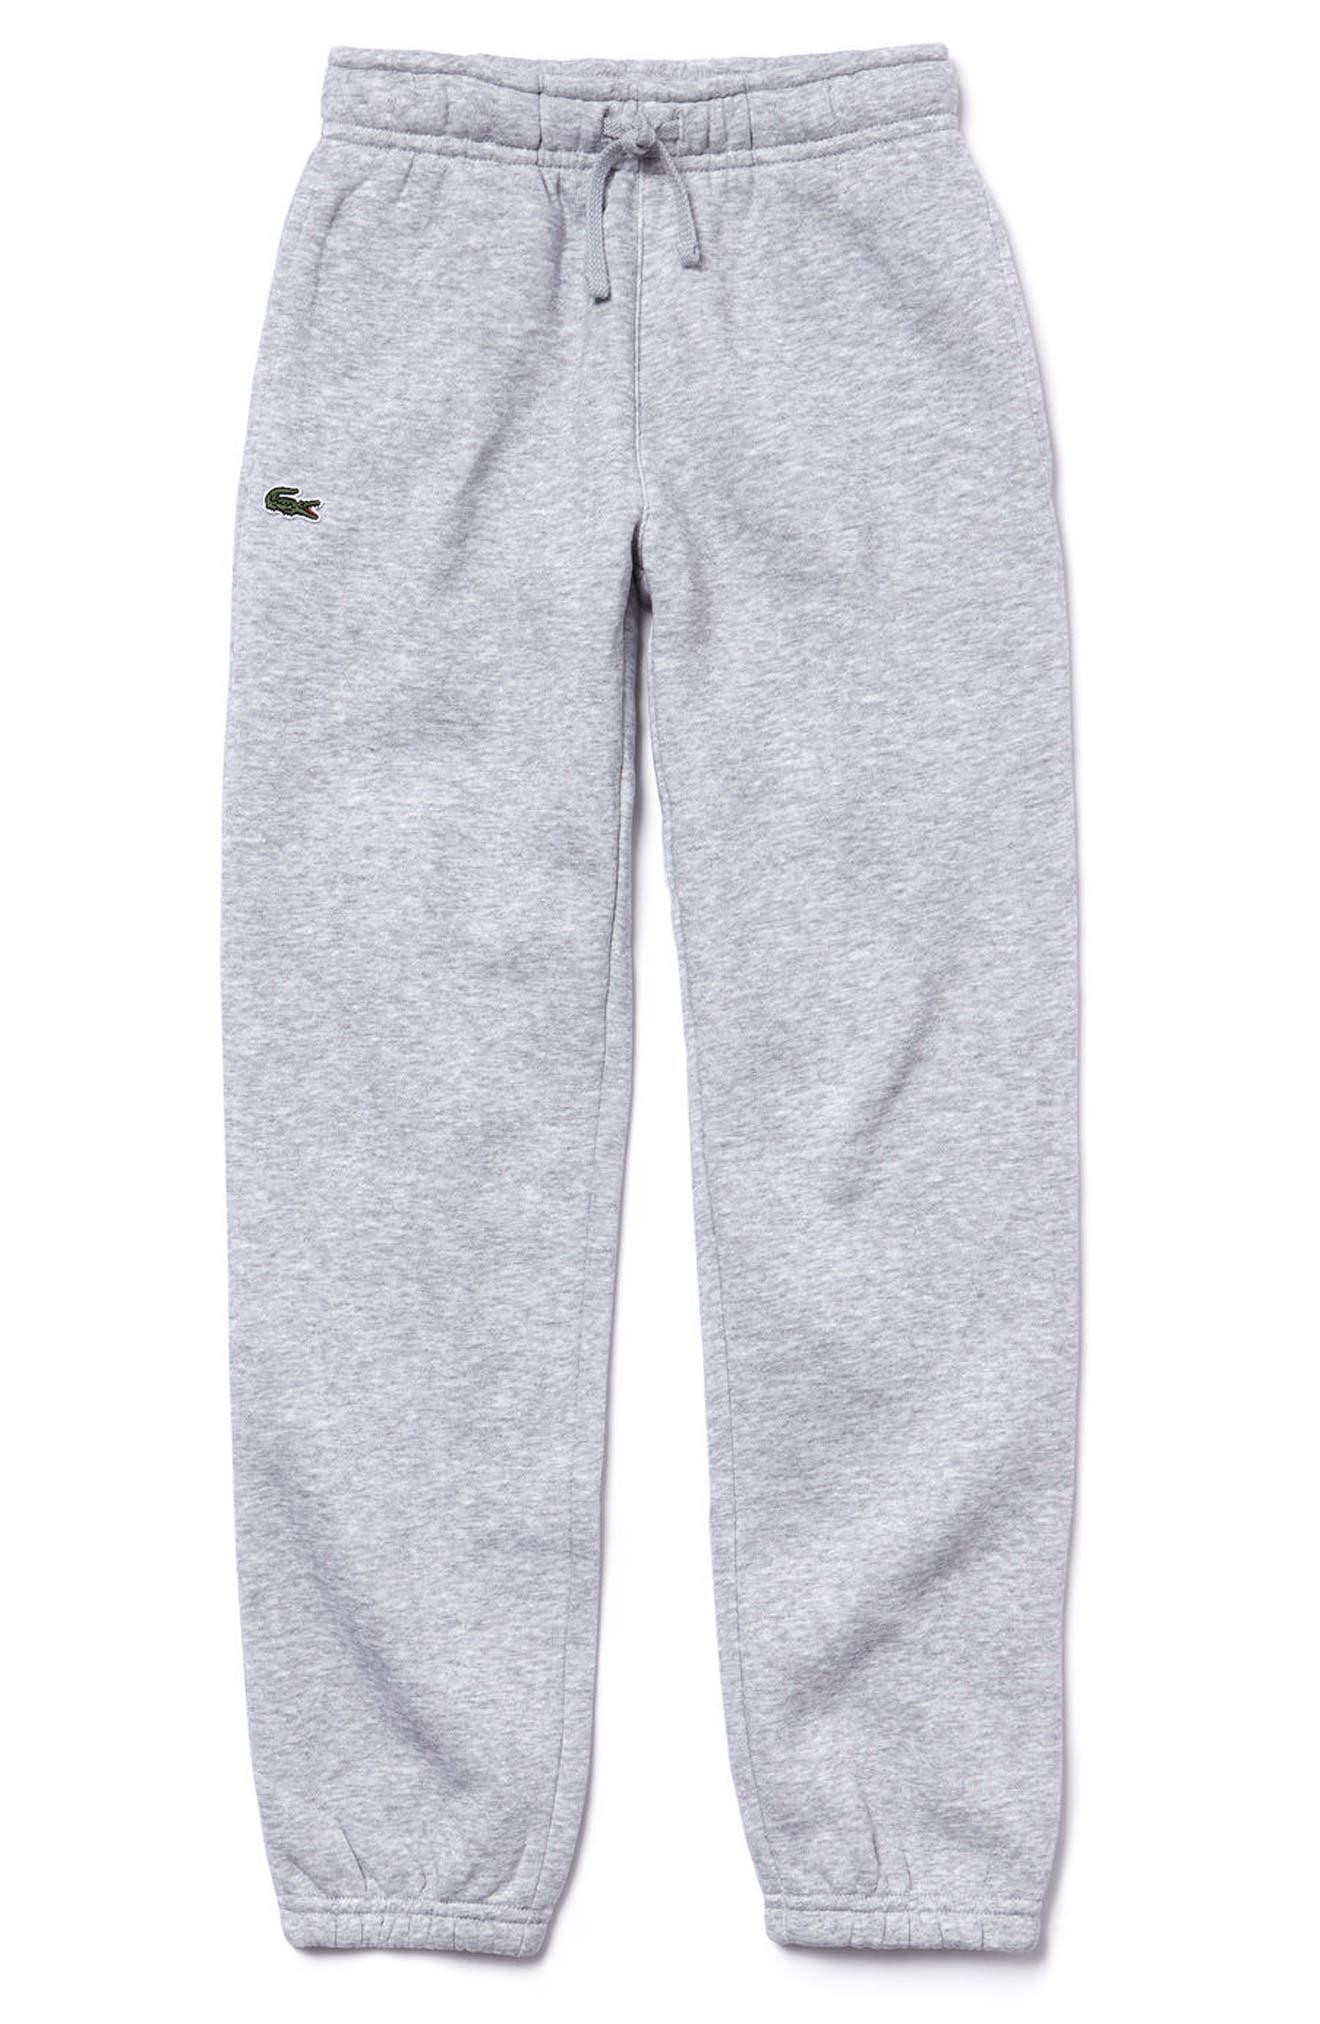 Sport Sweatpants,                             Main thumbnail 1, color,                             Silver Grey Chine